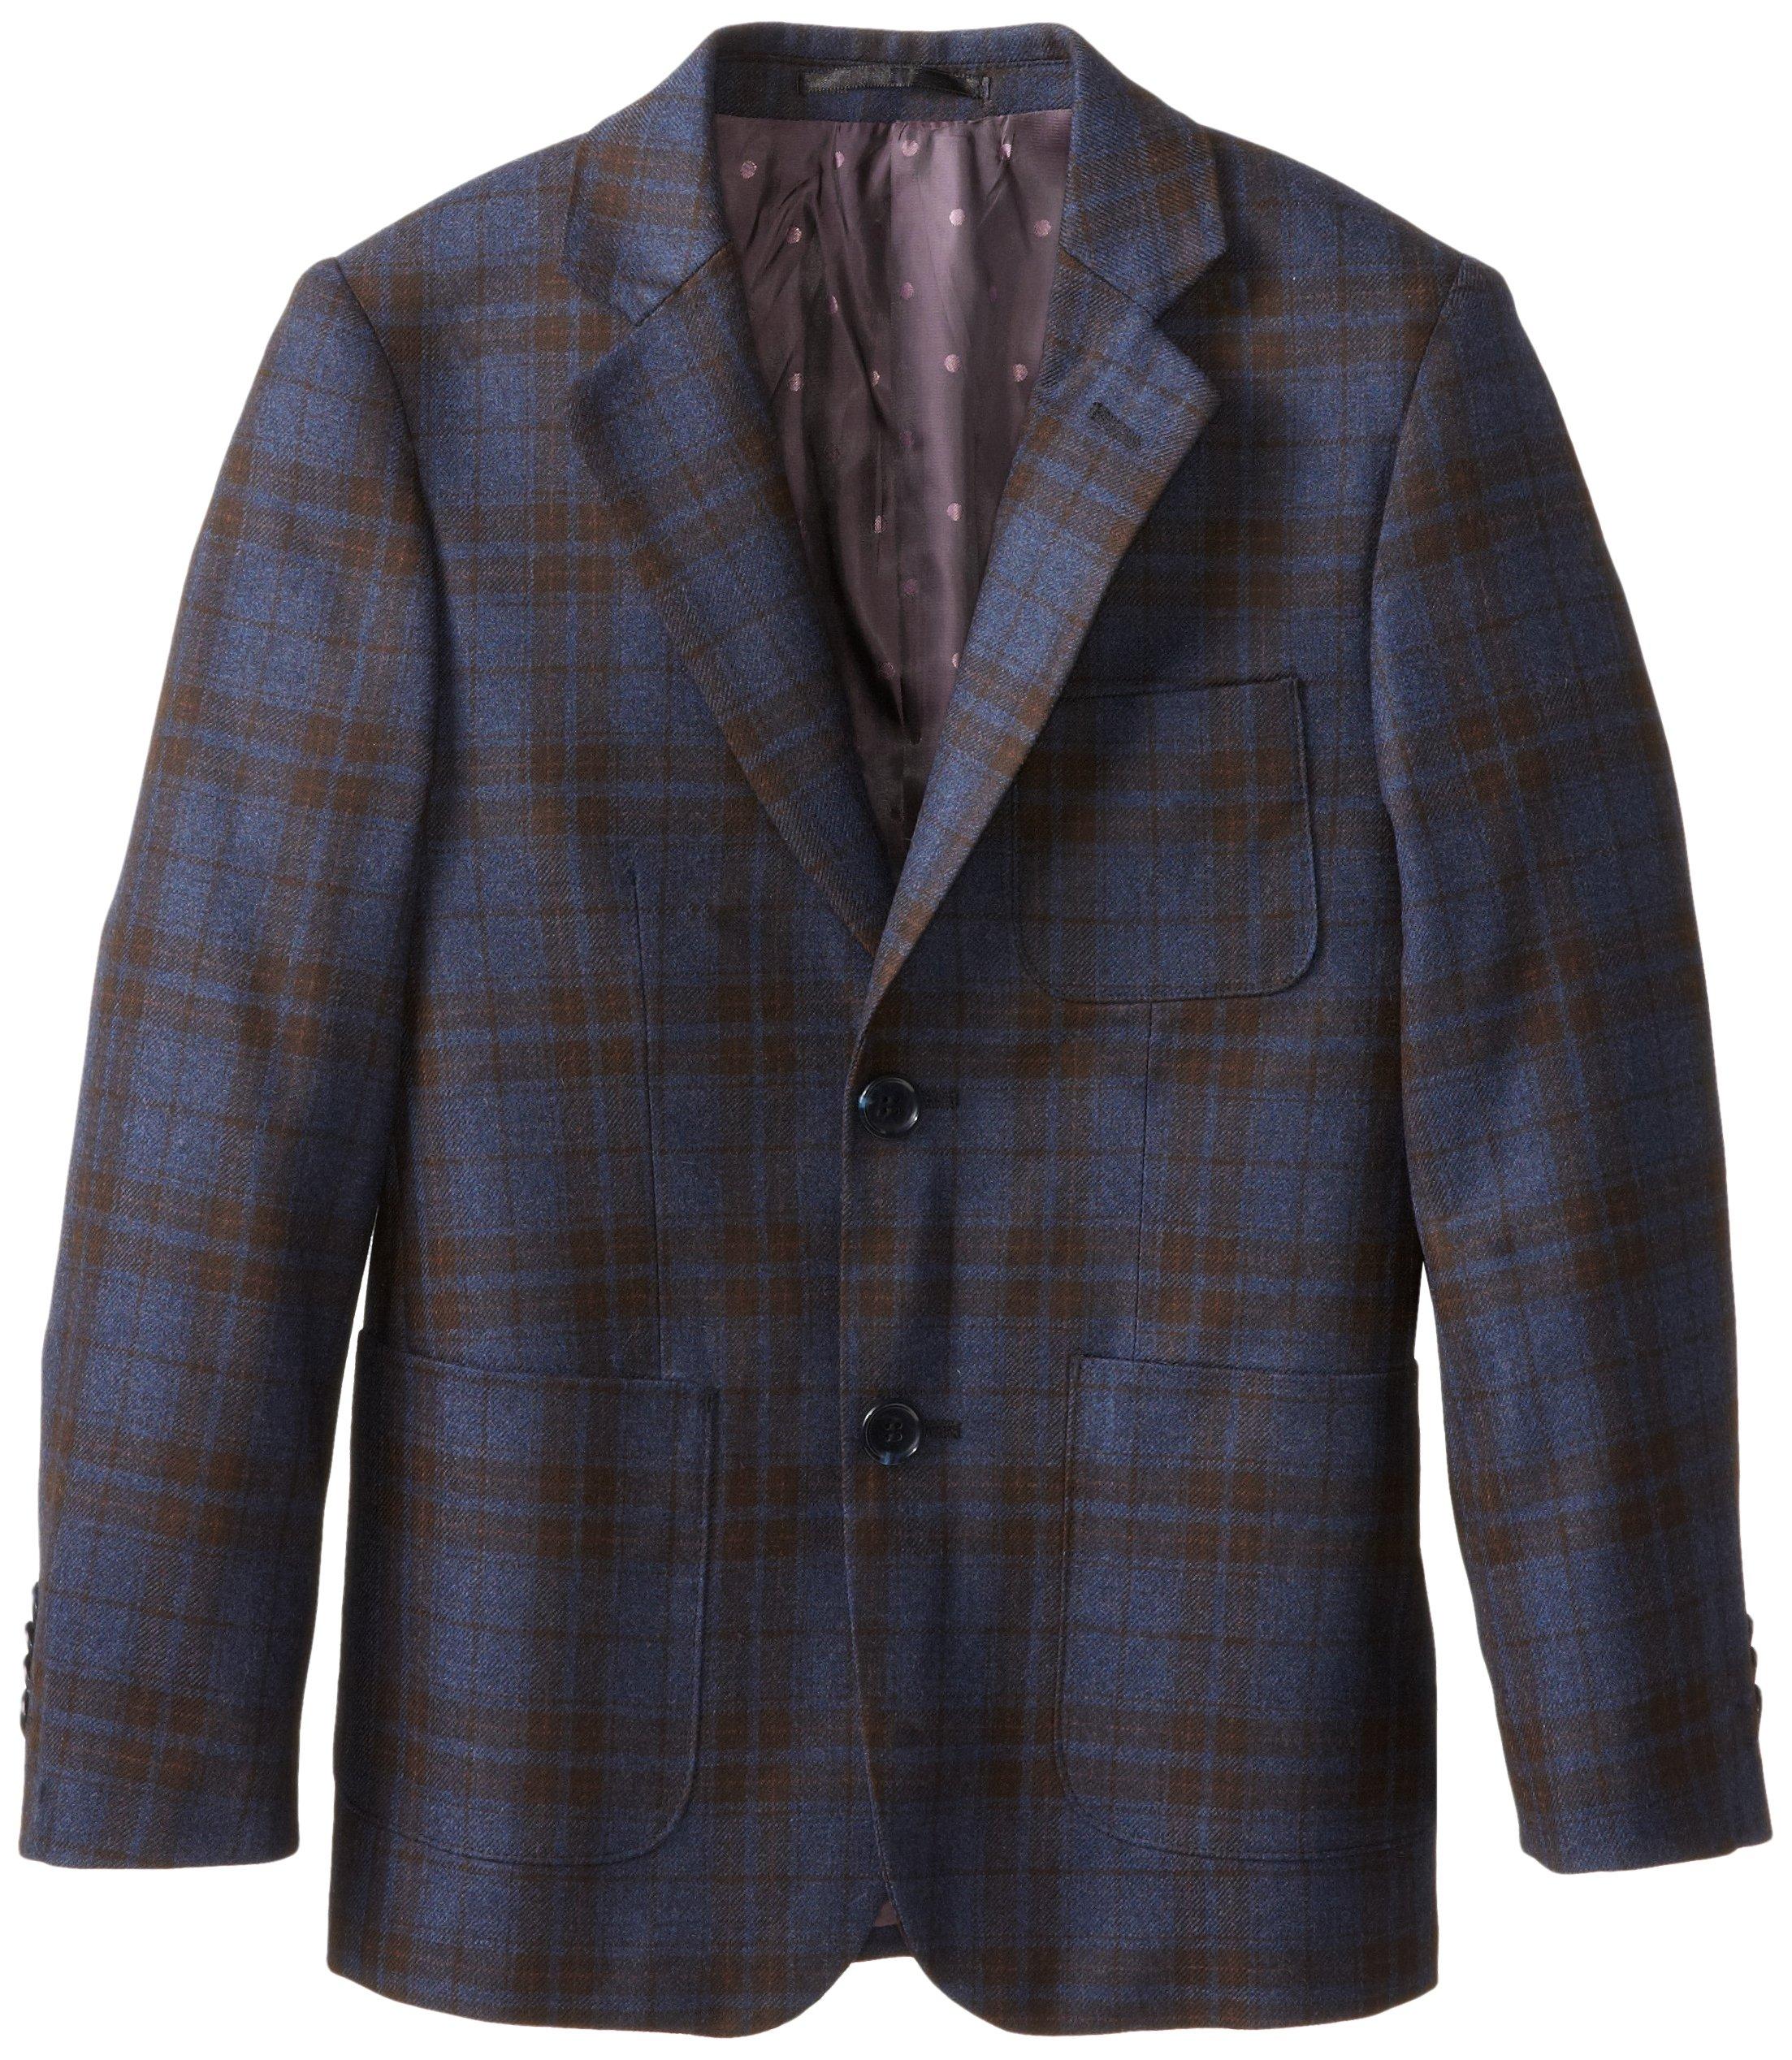 Isaac Mizrahi Black Label Big Boys' Pure Wool Large Plaid Blazer, Blue, 8 by Isaac Mizrahi